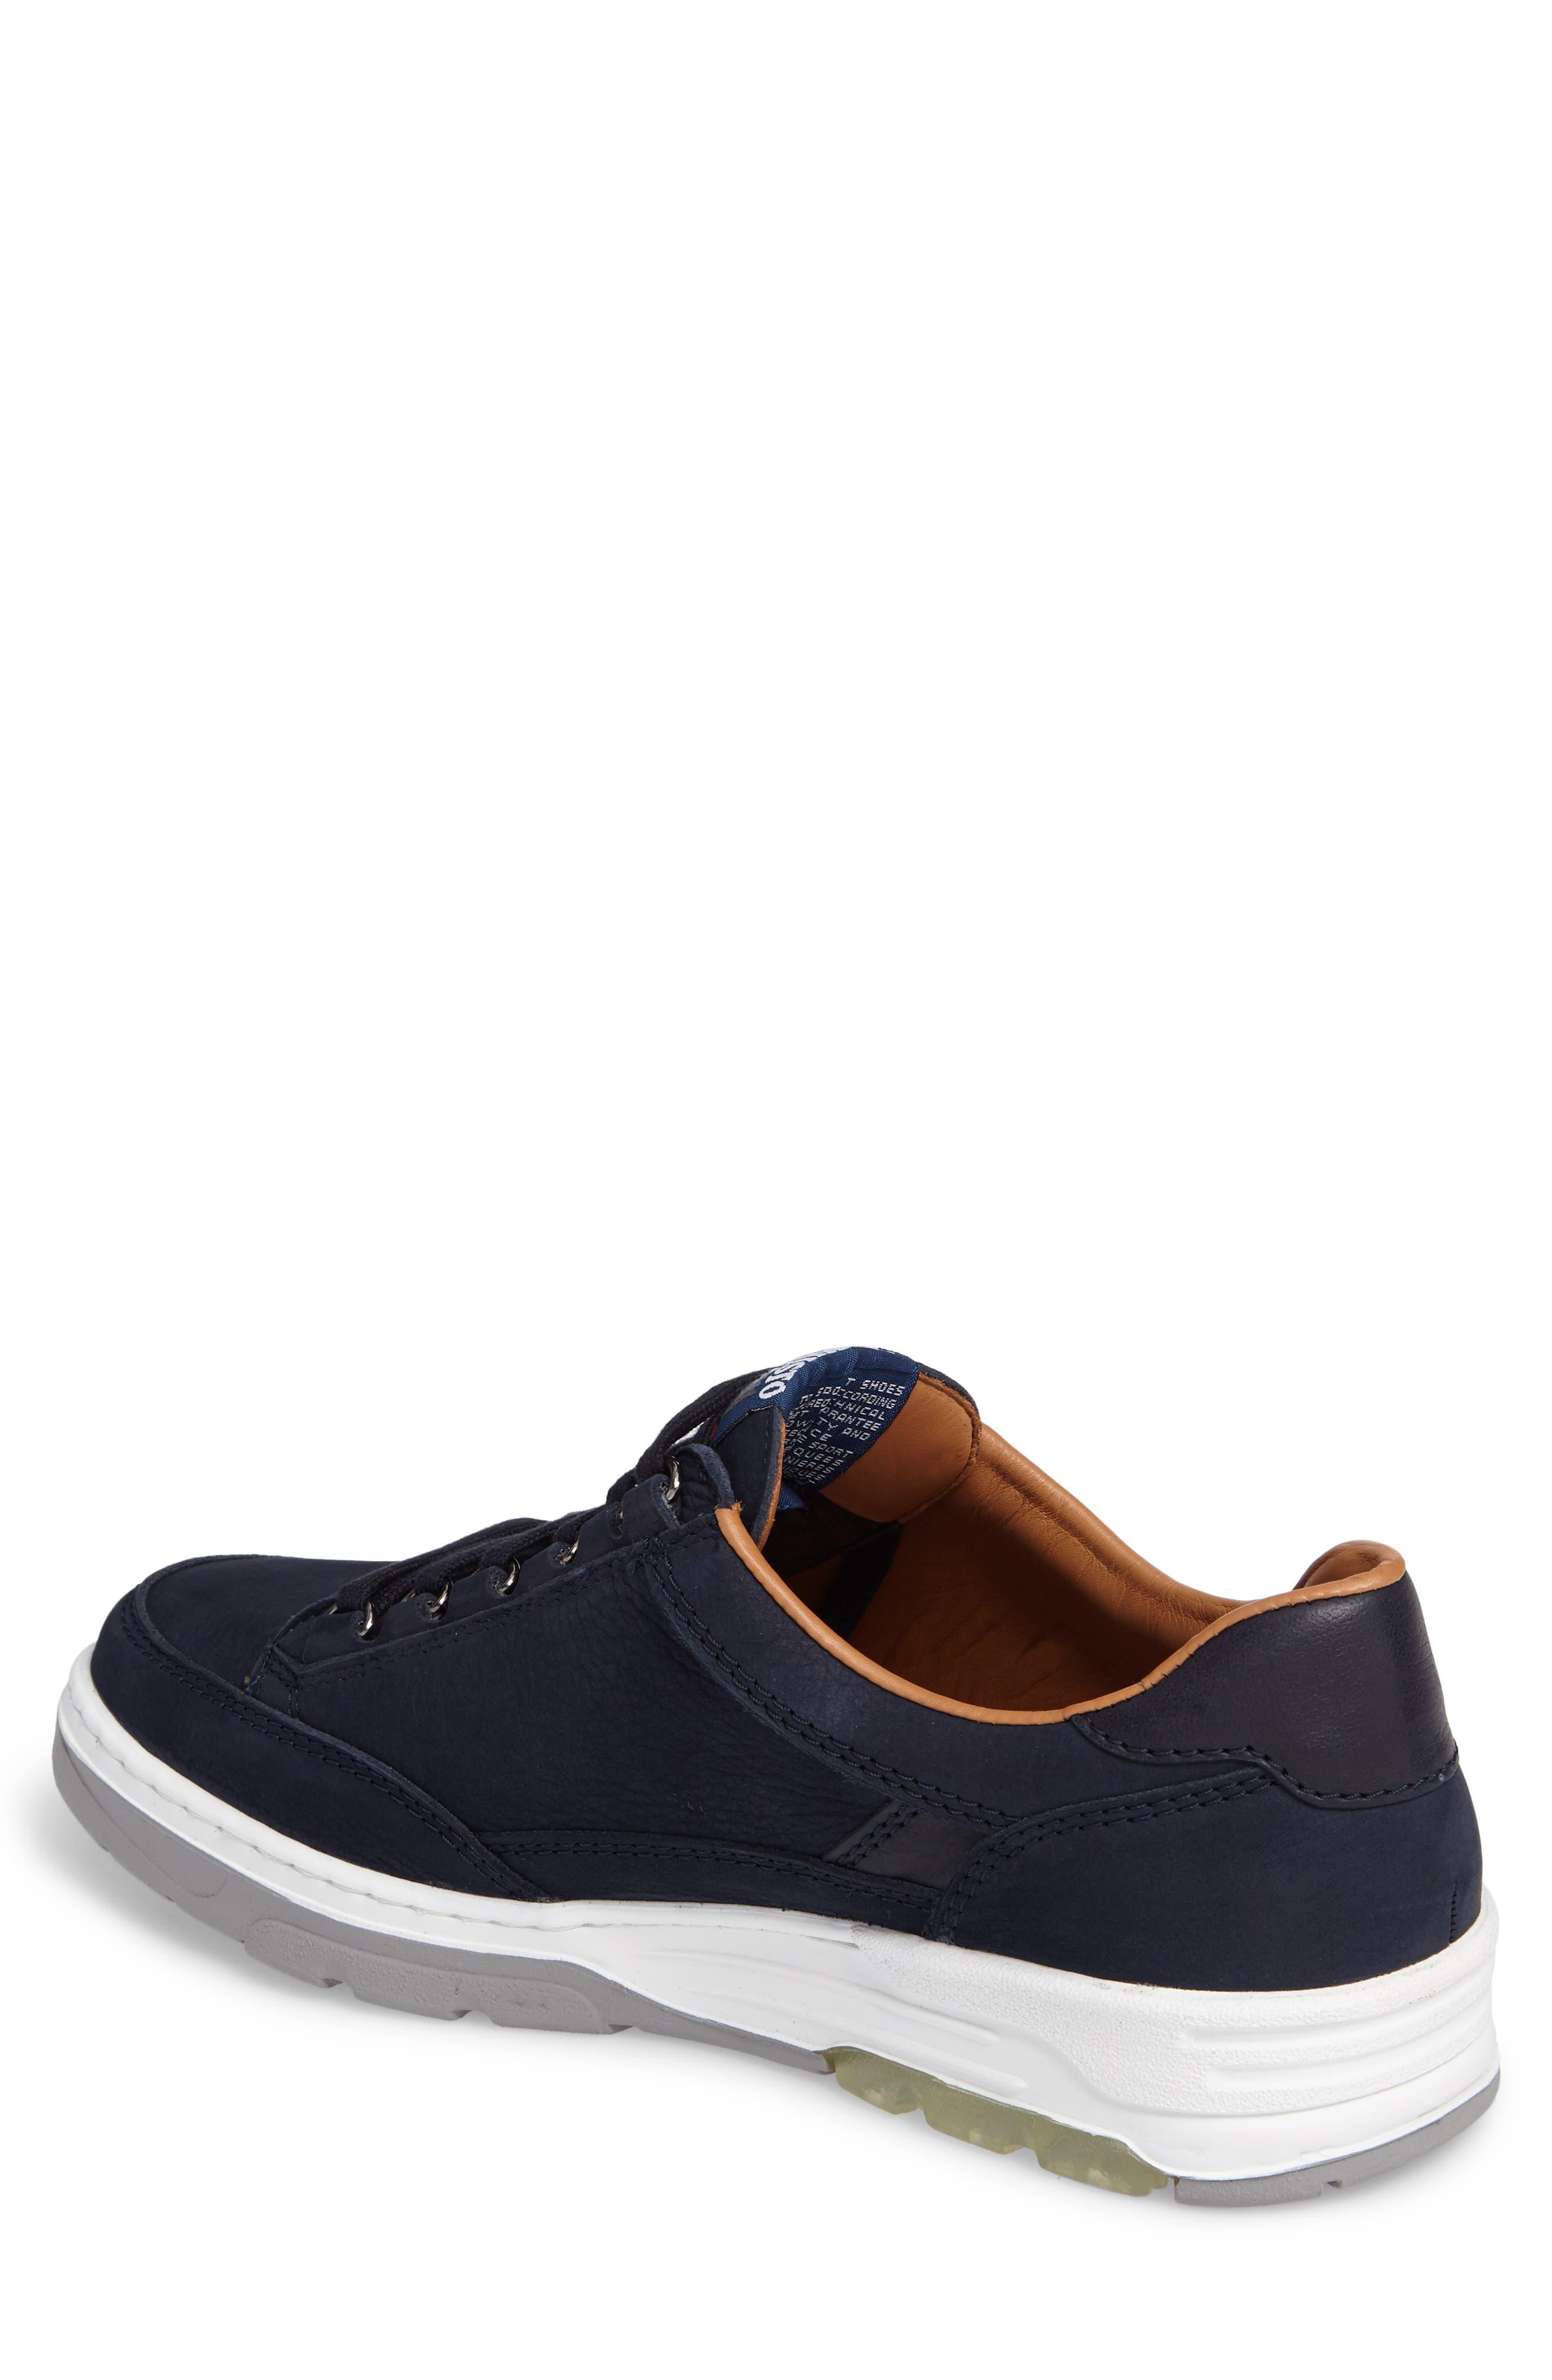 Mick Sneaker,                             Alternate thumbnail 8, color,